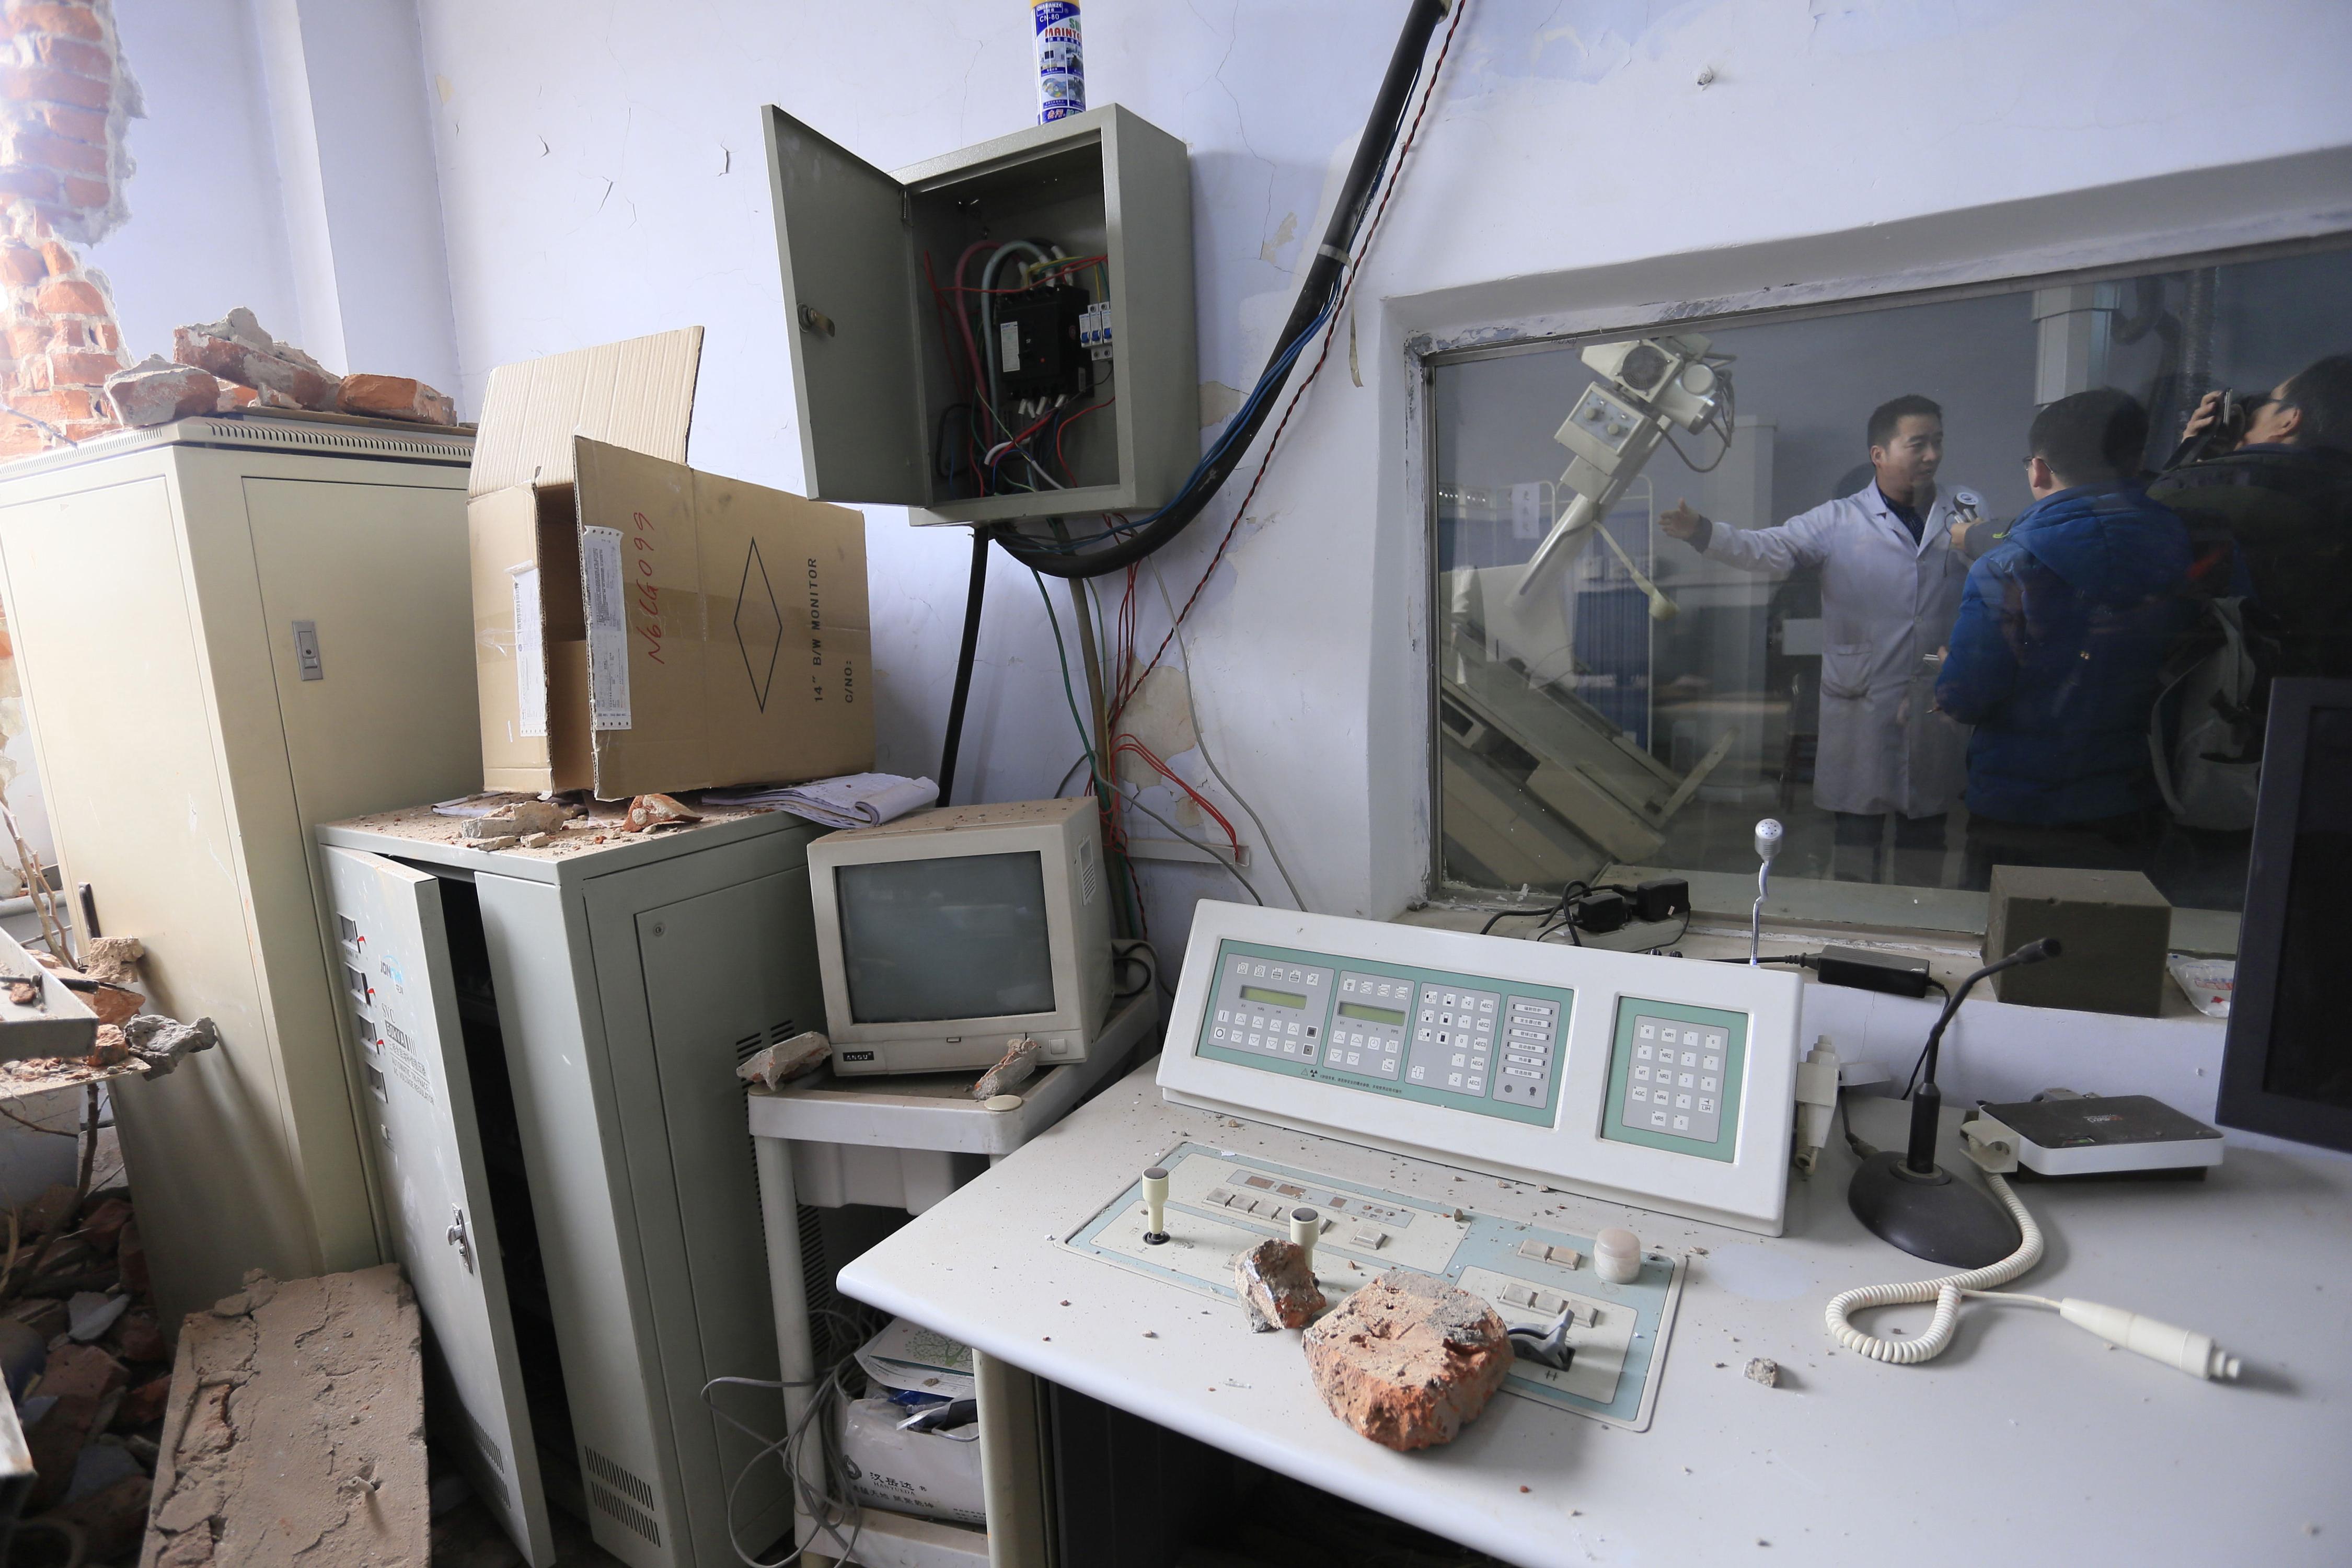 Demolition Crews Bulldoze Hospital While Still Operational